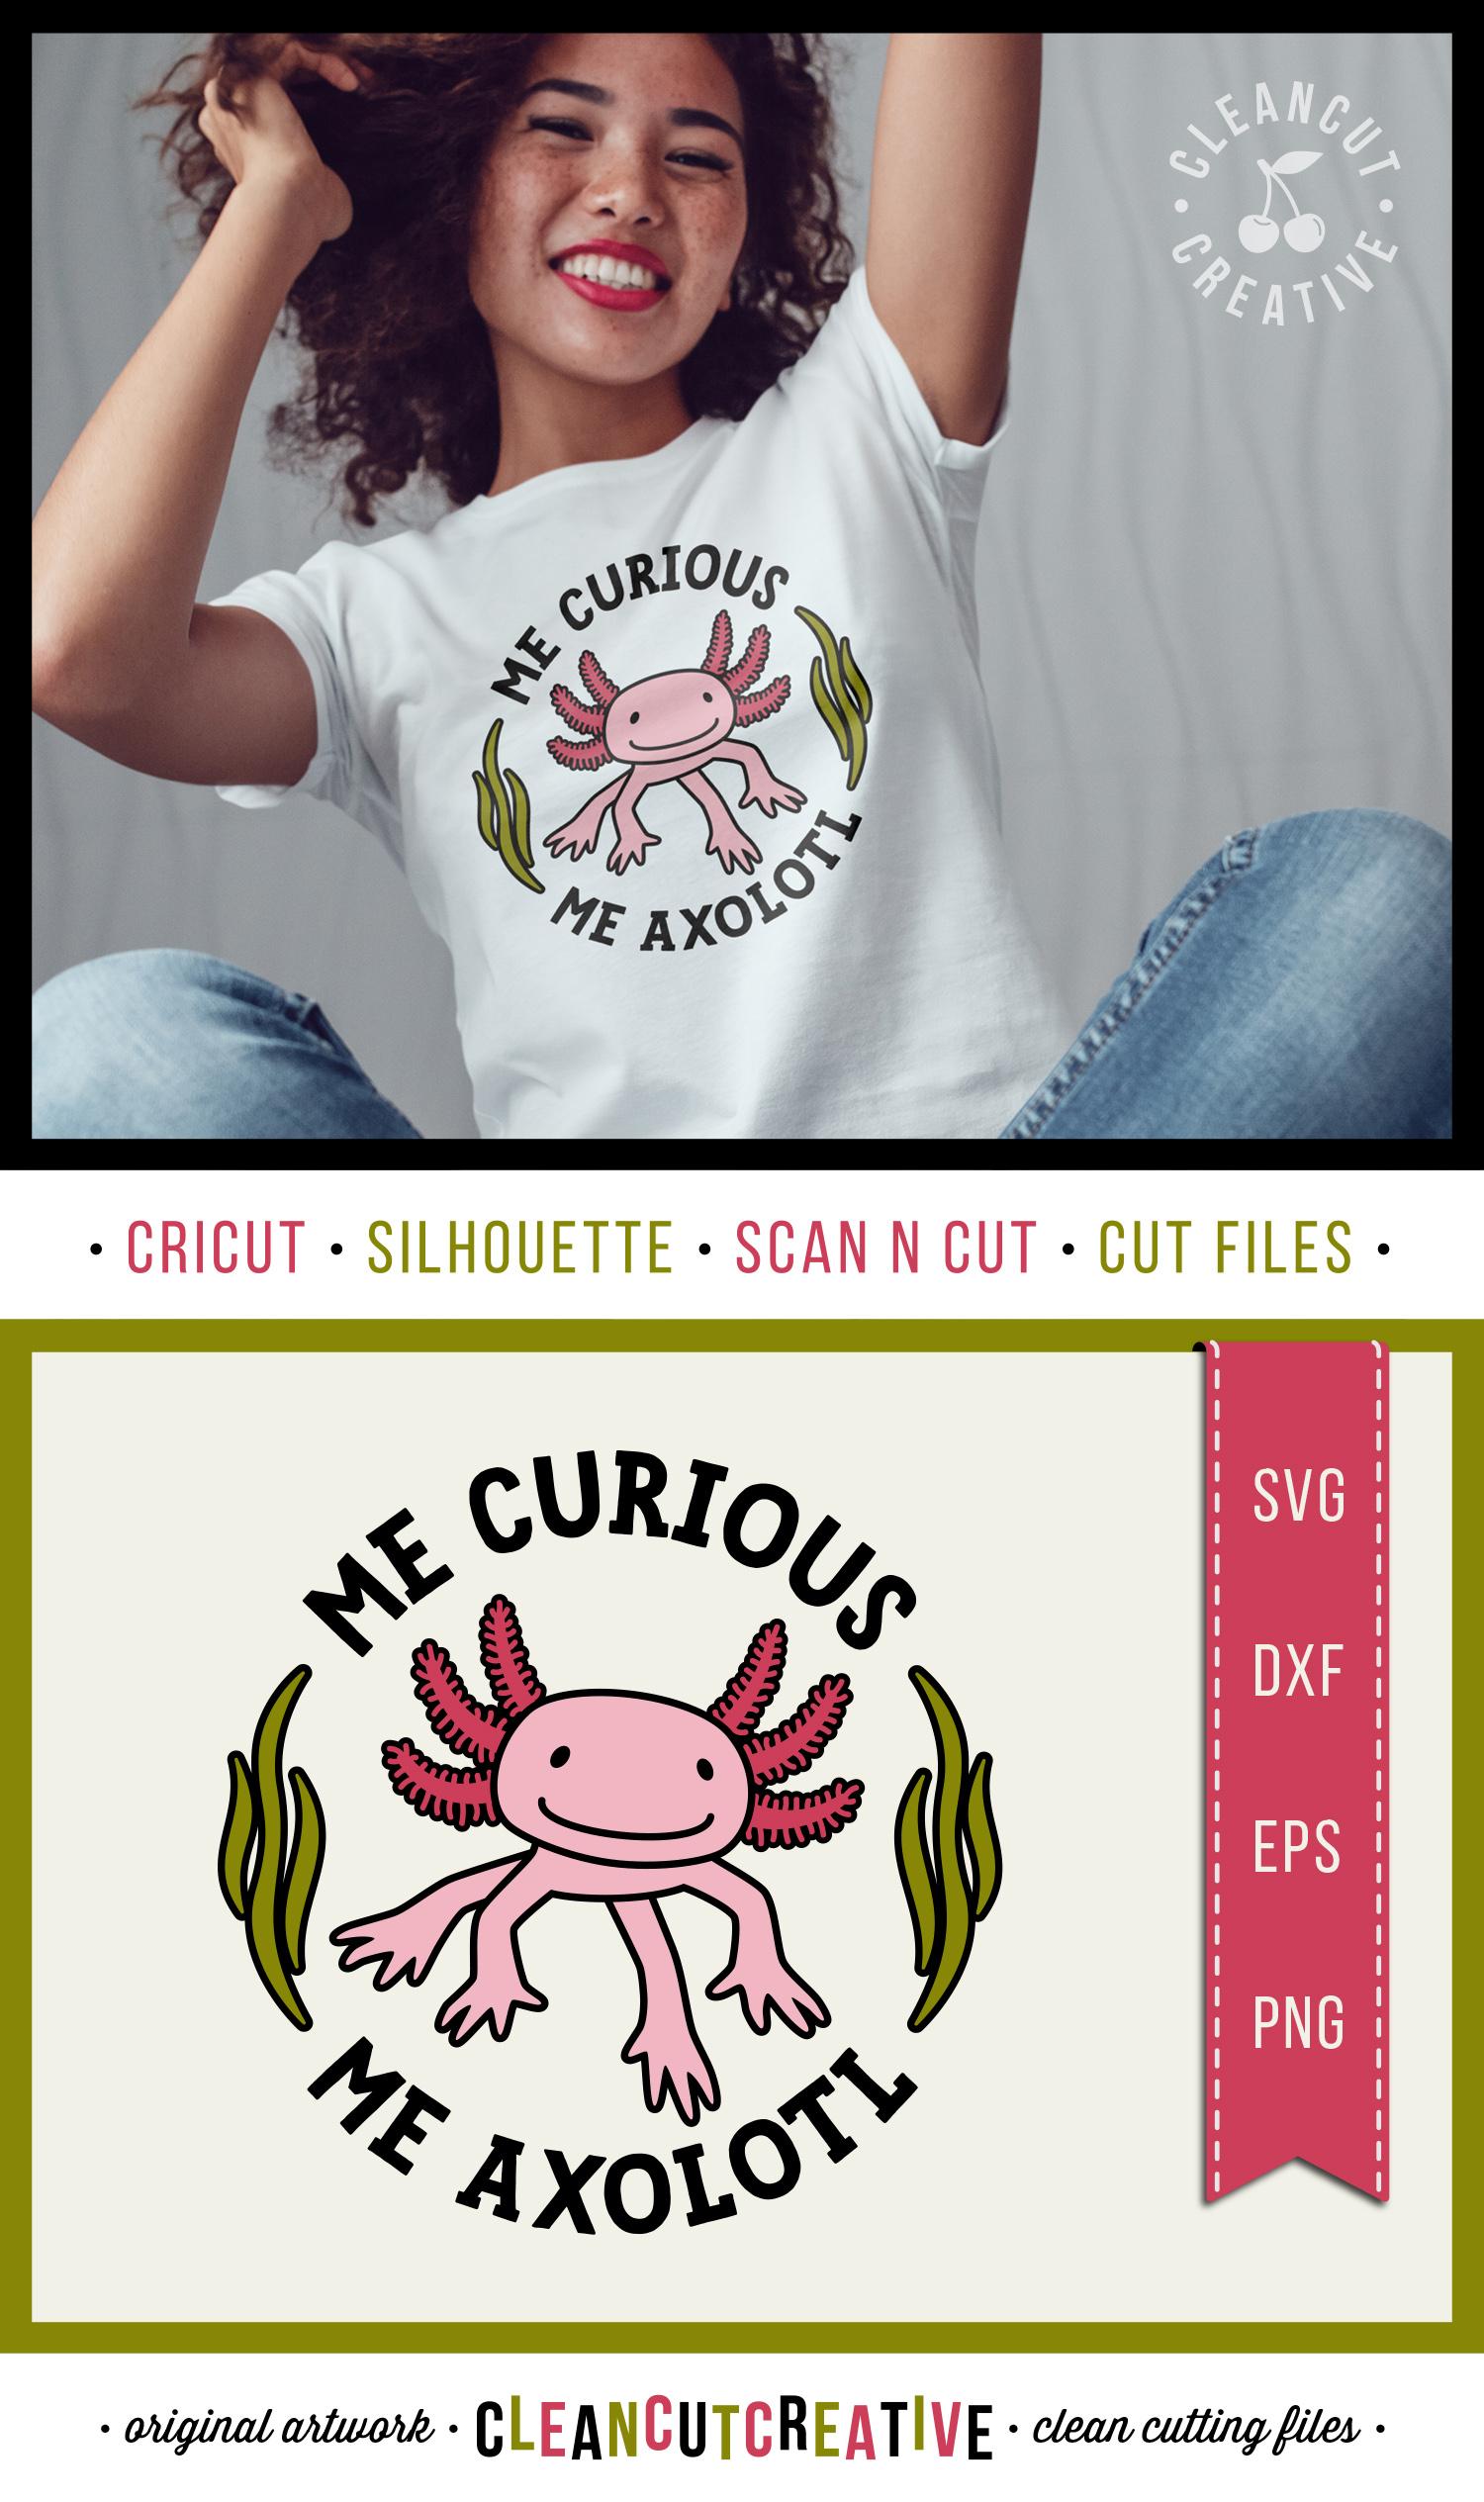 Me Curious - Me Axolotl svg funny cute animal t-shirt design example image 5